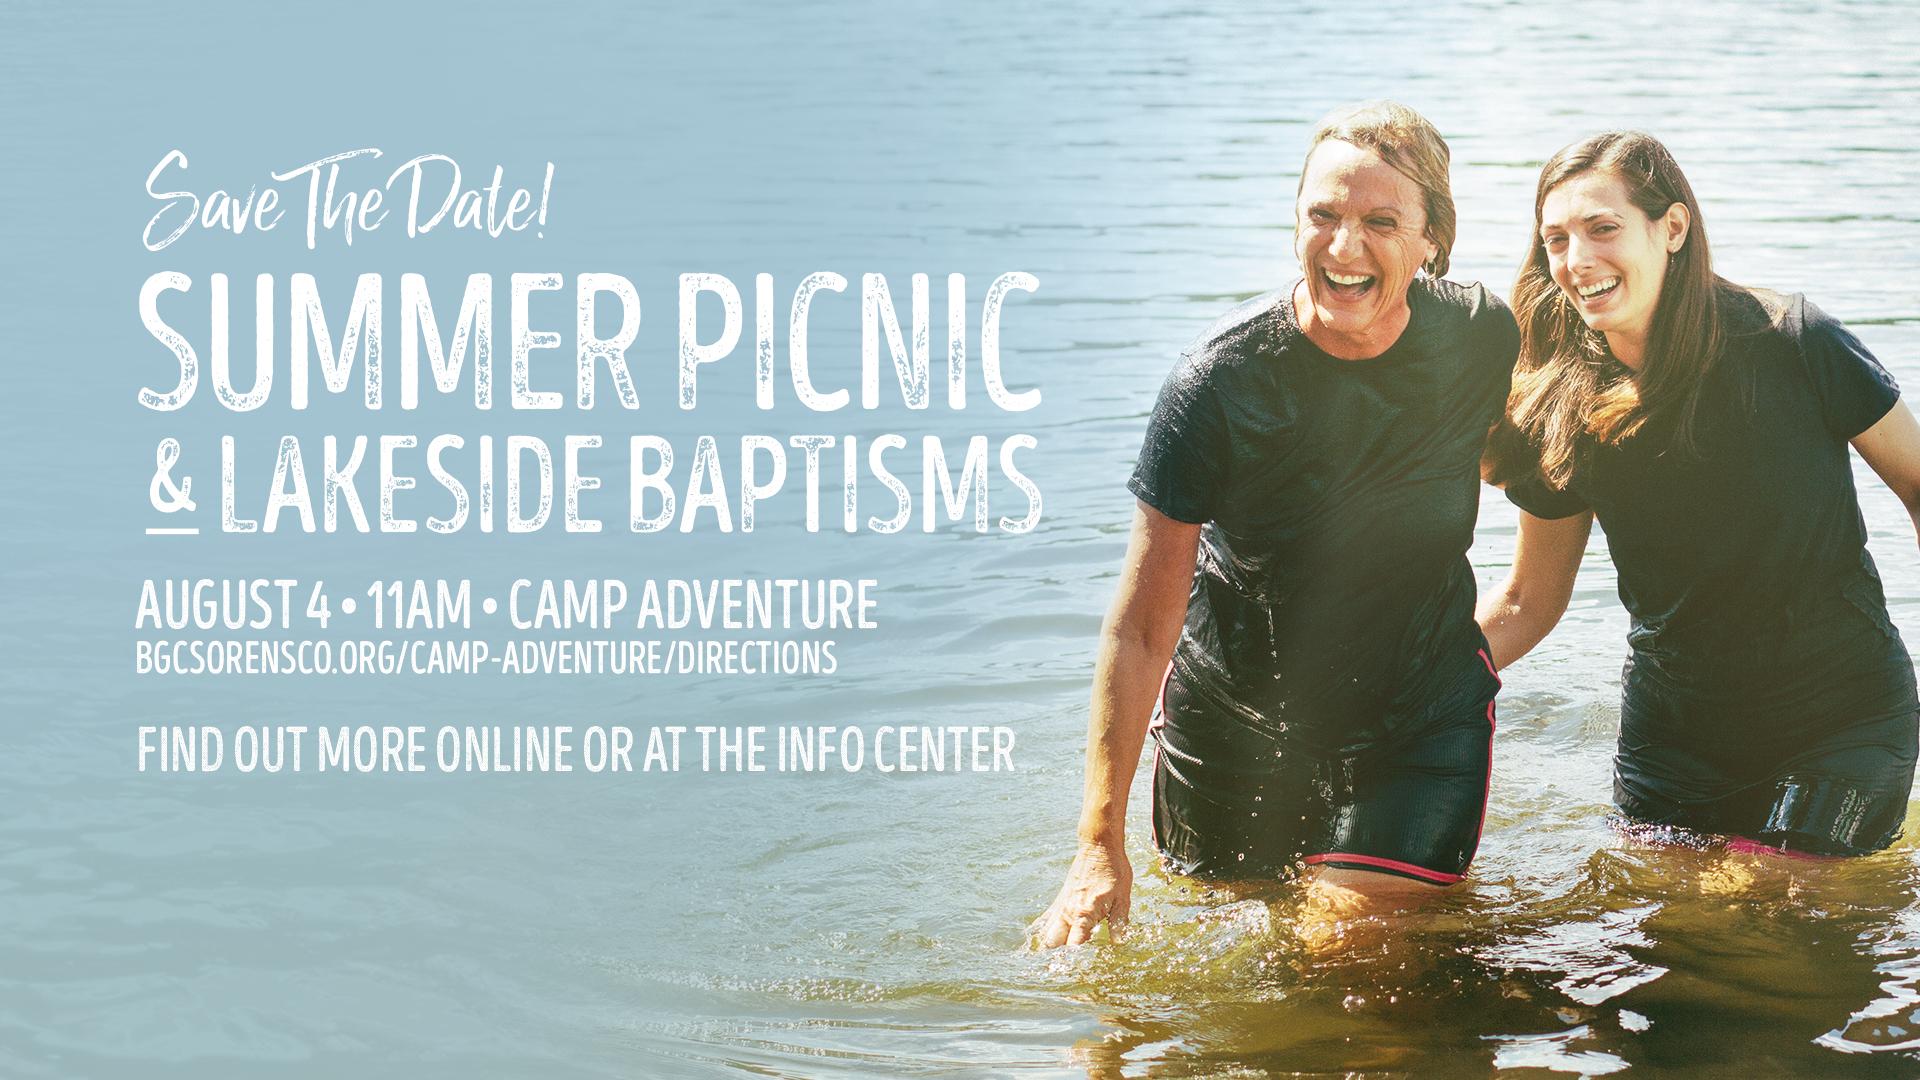 Summer Picnic at the Lake!  Saturday August 4th